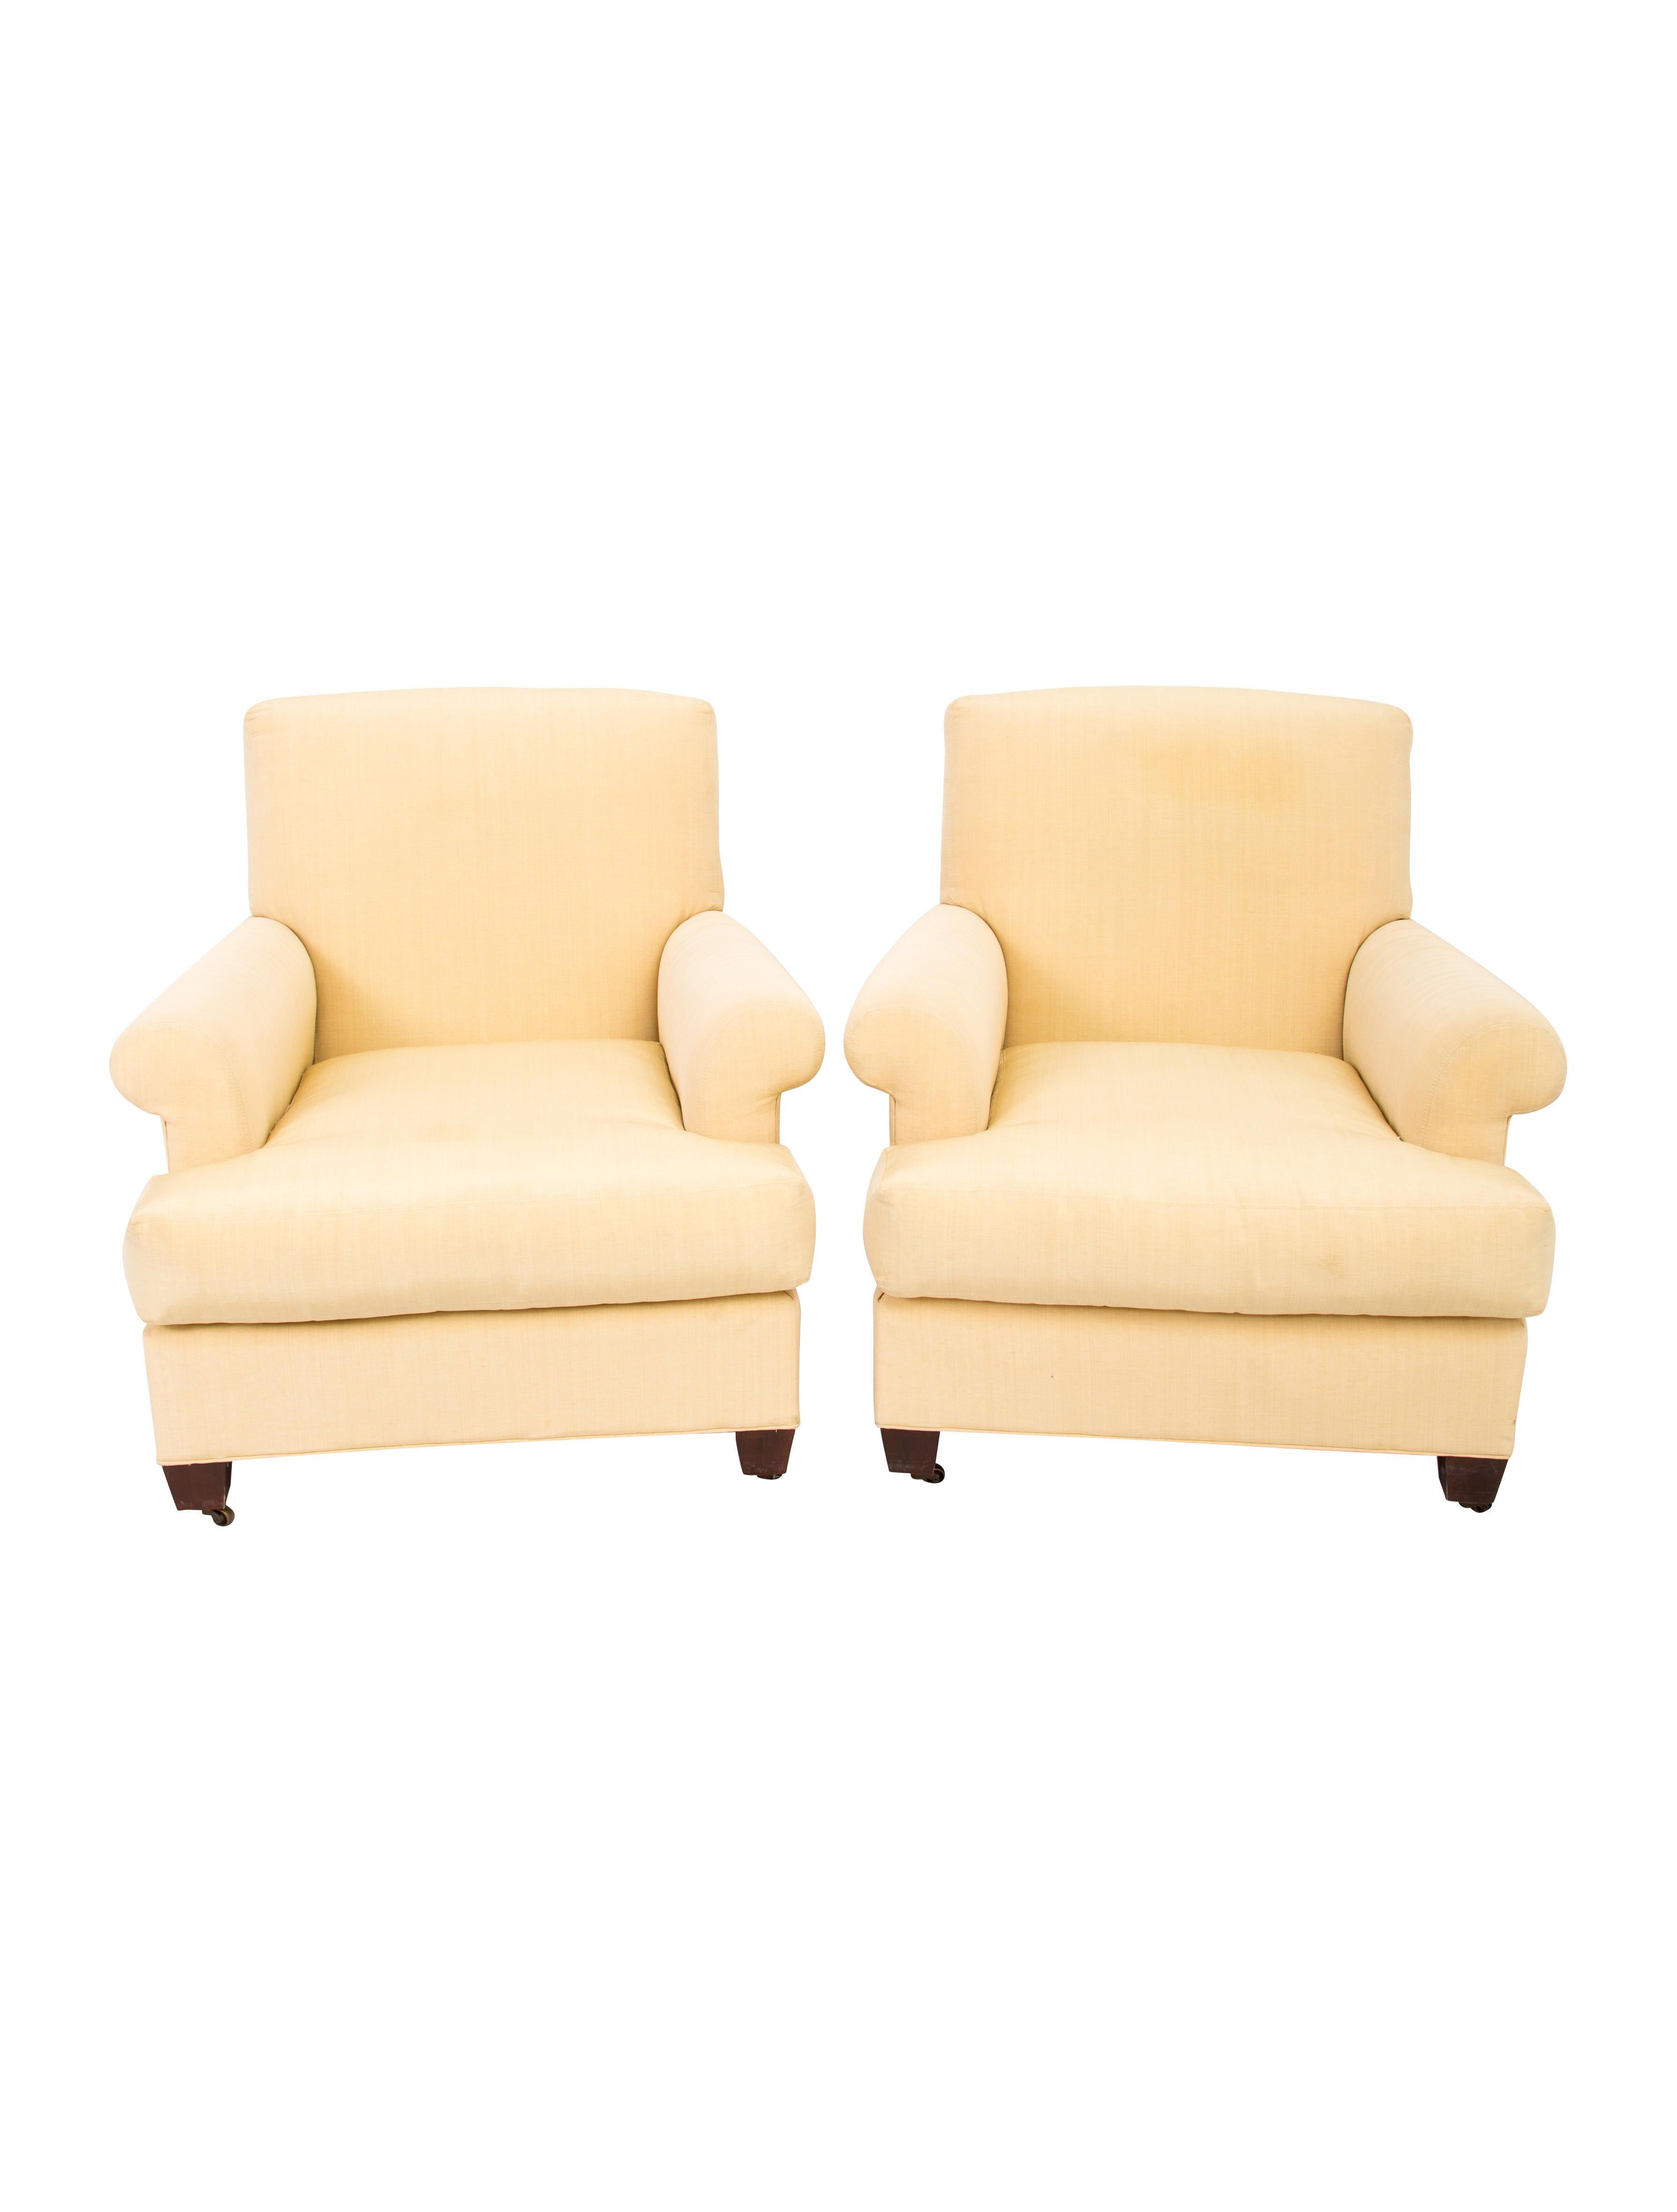 Ralph lauren pair of club chairs furniture wyg21480 for Ralph lauren outdoor furniture